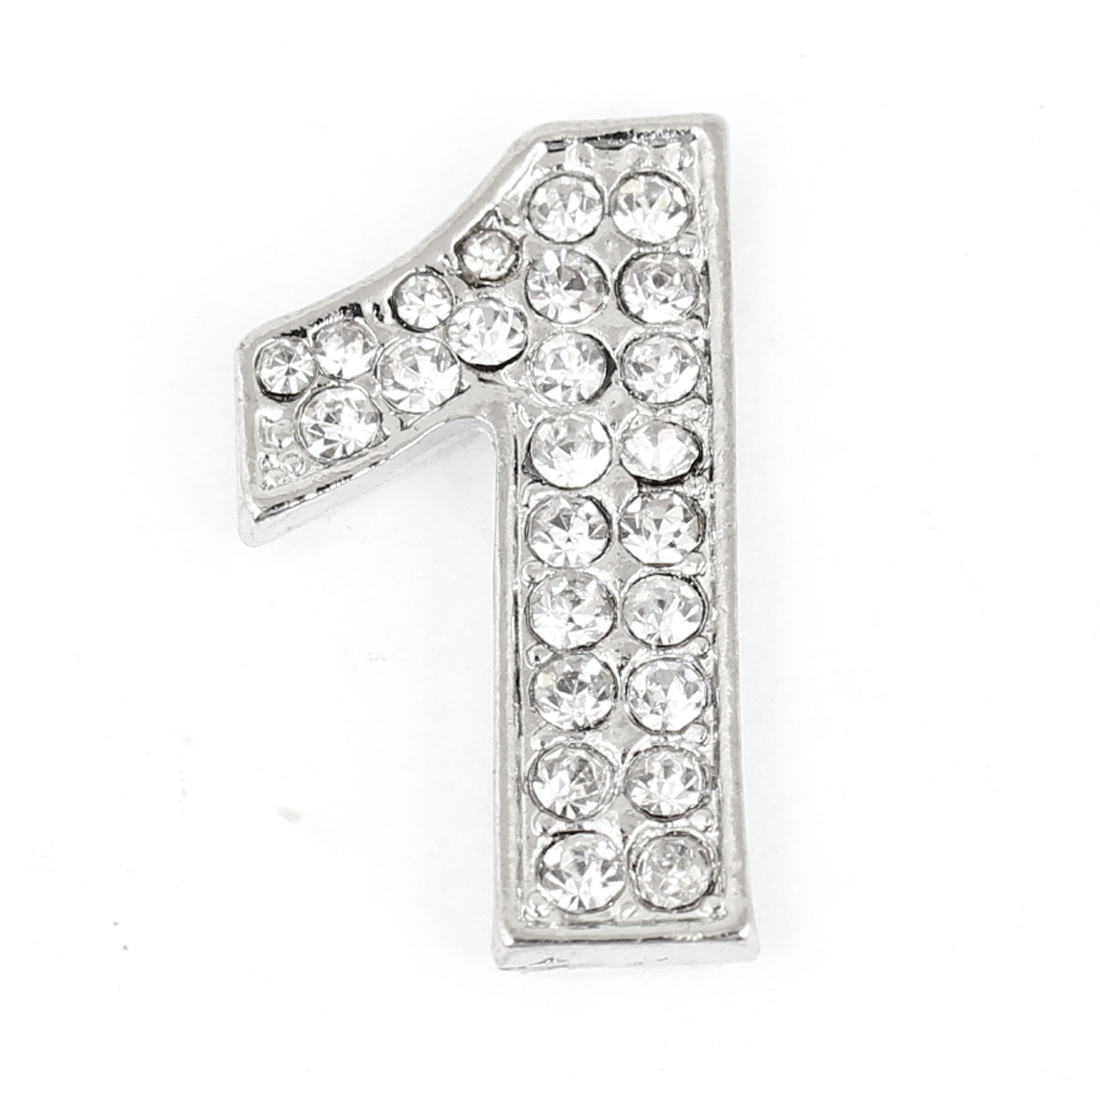 Rhinestones Inlaid Silver Tone Arabic Number One Shaped Car Sticker Decoration